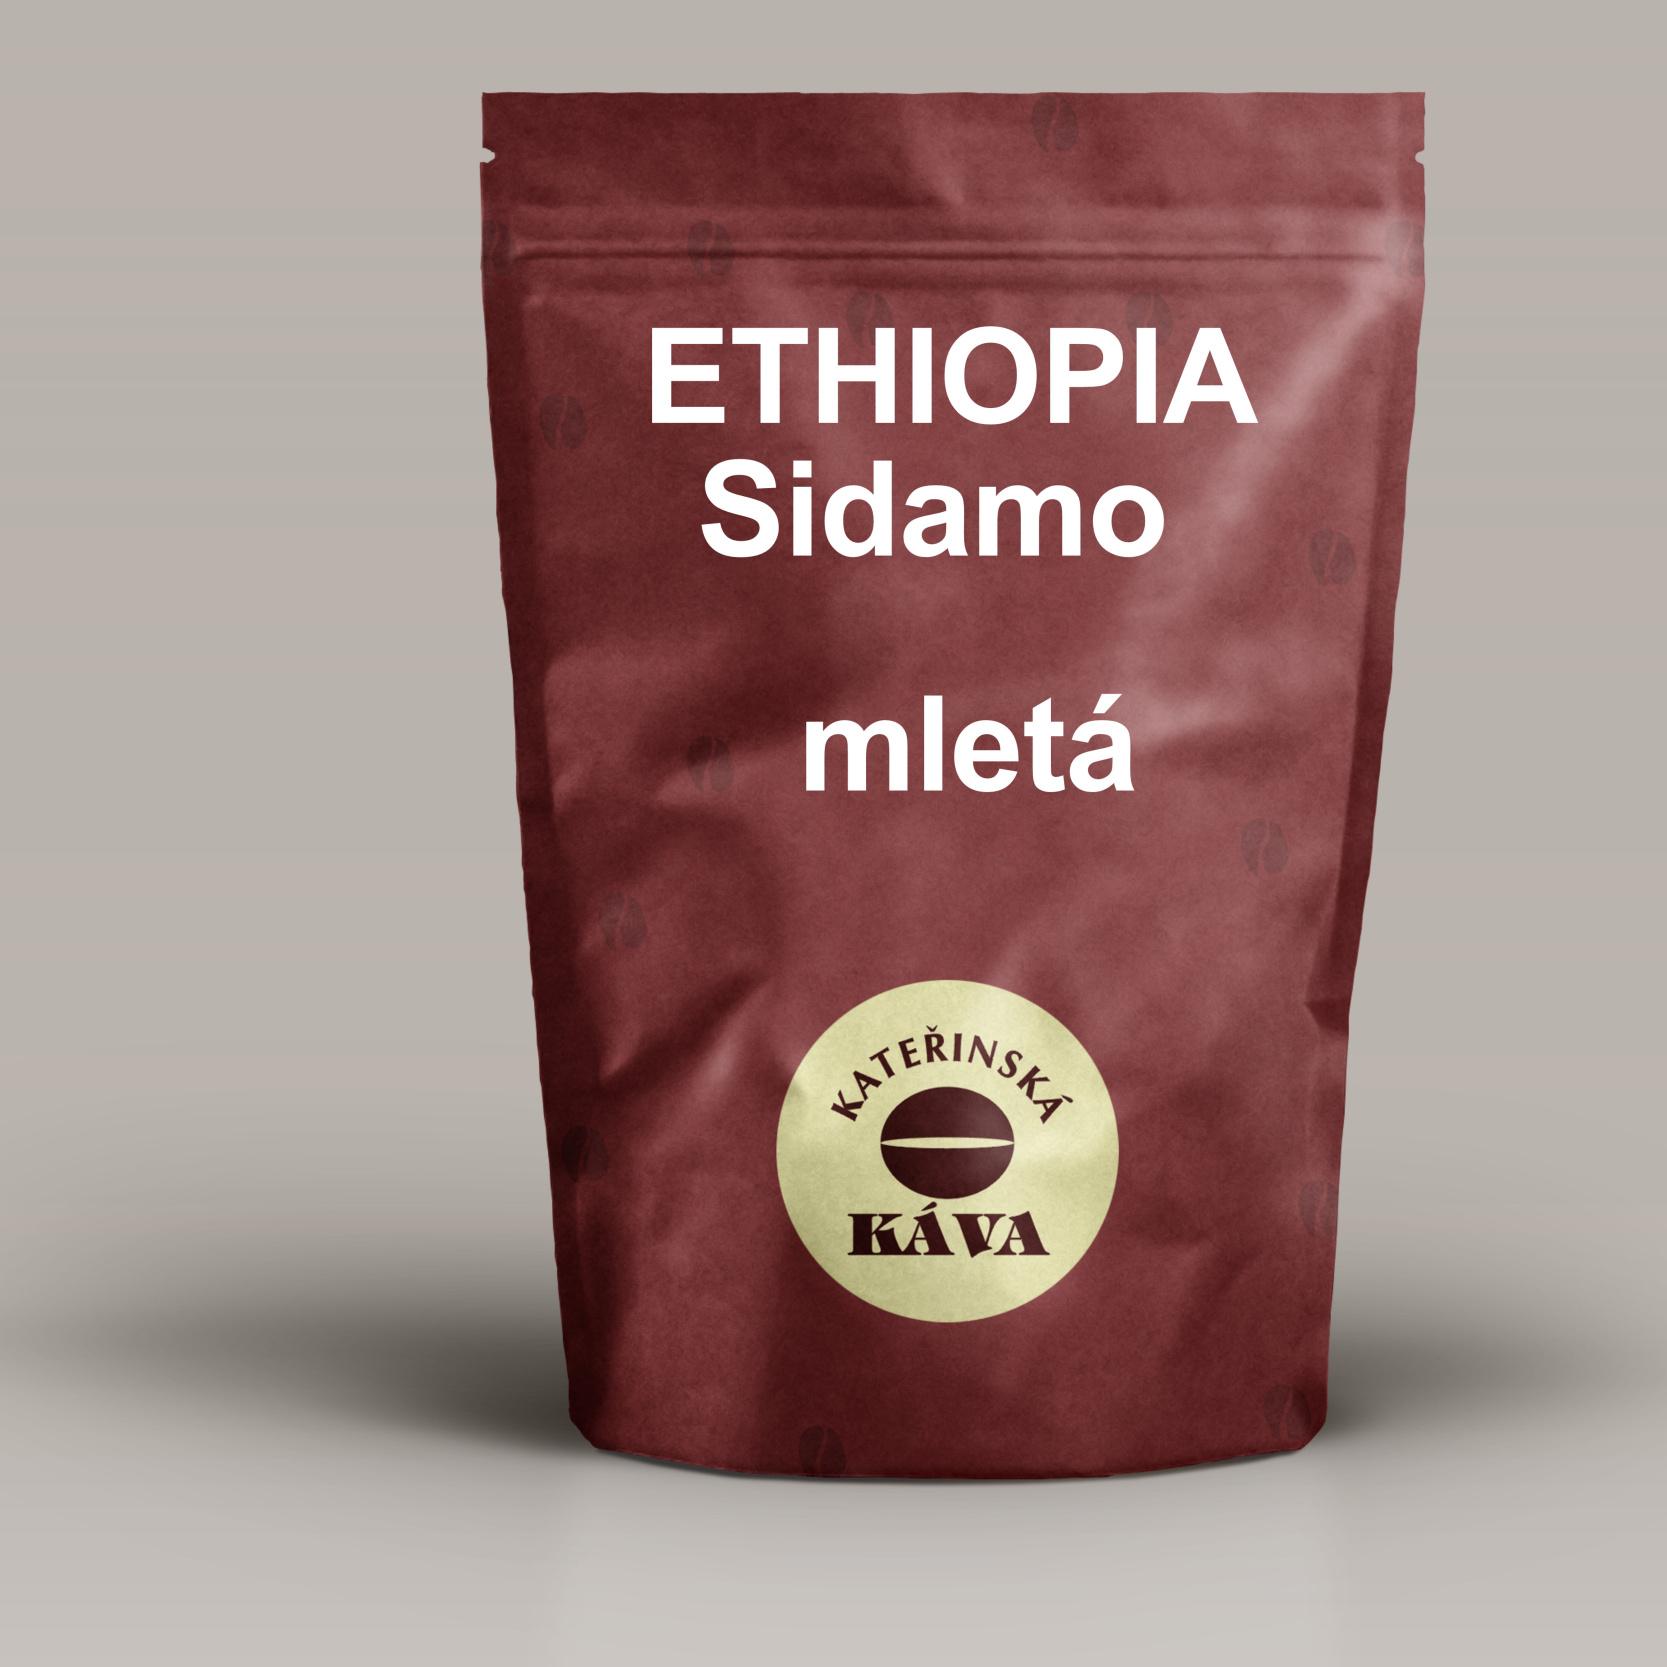 ETHIOPIA Sidamo-mletá